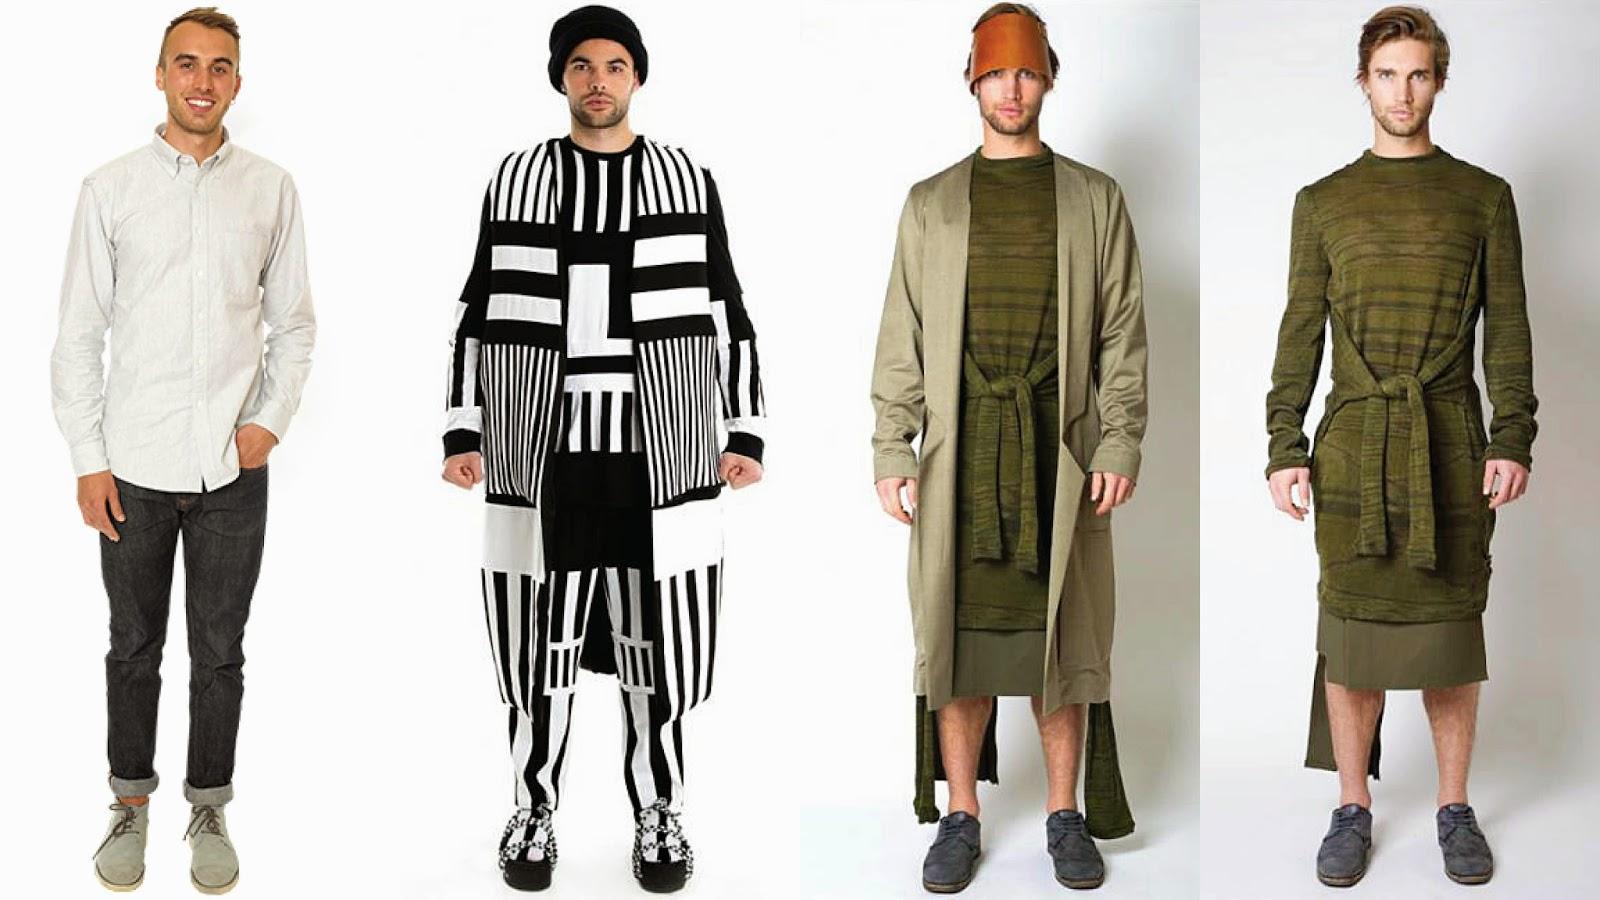 Nina Garcia s Best Style Tips - How to Dress Like a Fashion Editor 69